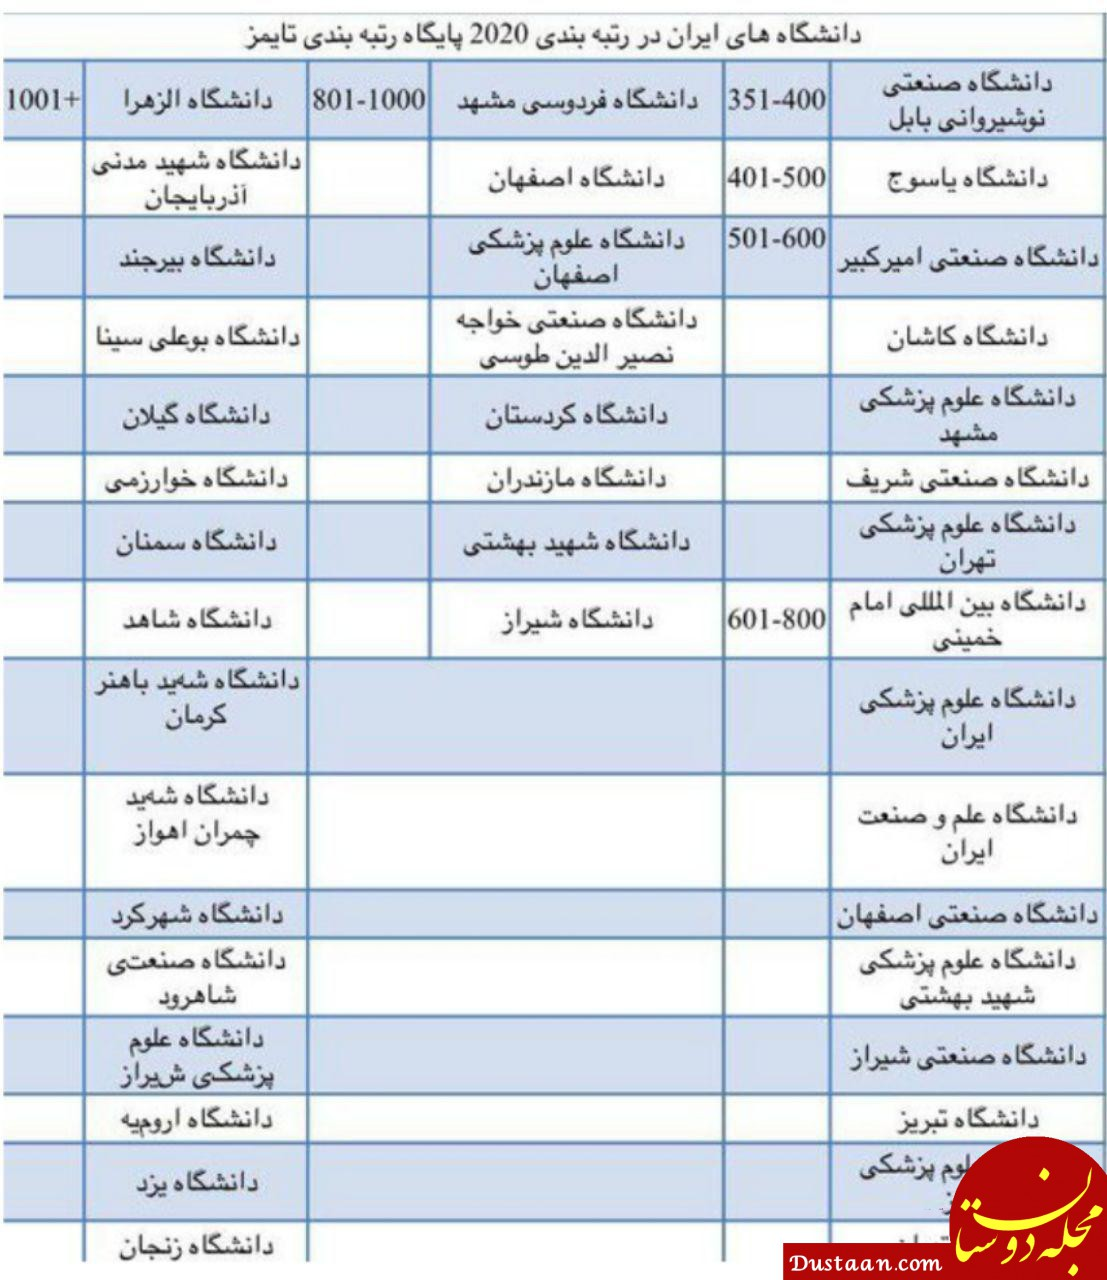 www.dustaan.com حضور 40 دانشگاه ایران در رتبه بندی جهانی تایمز